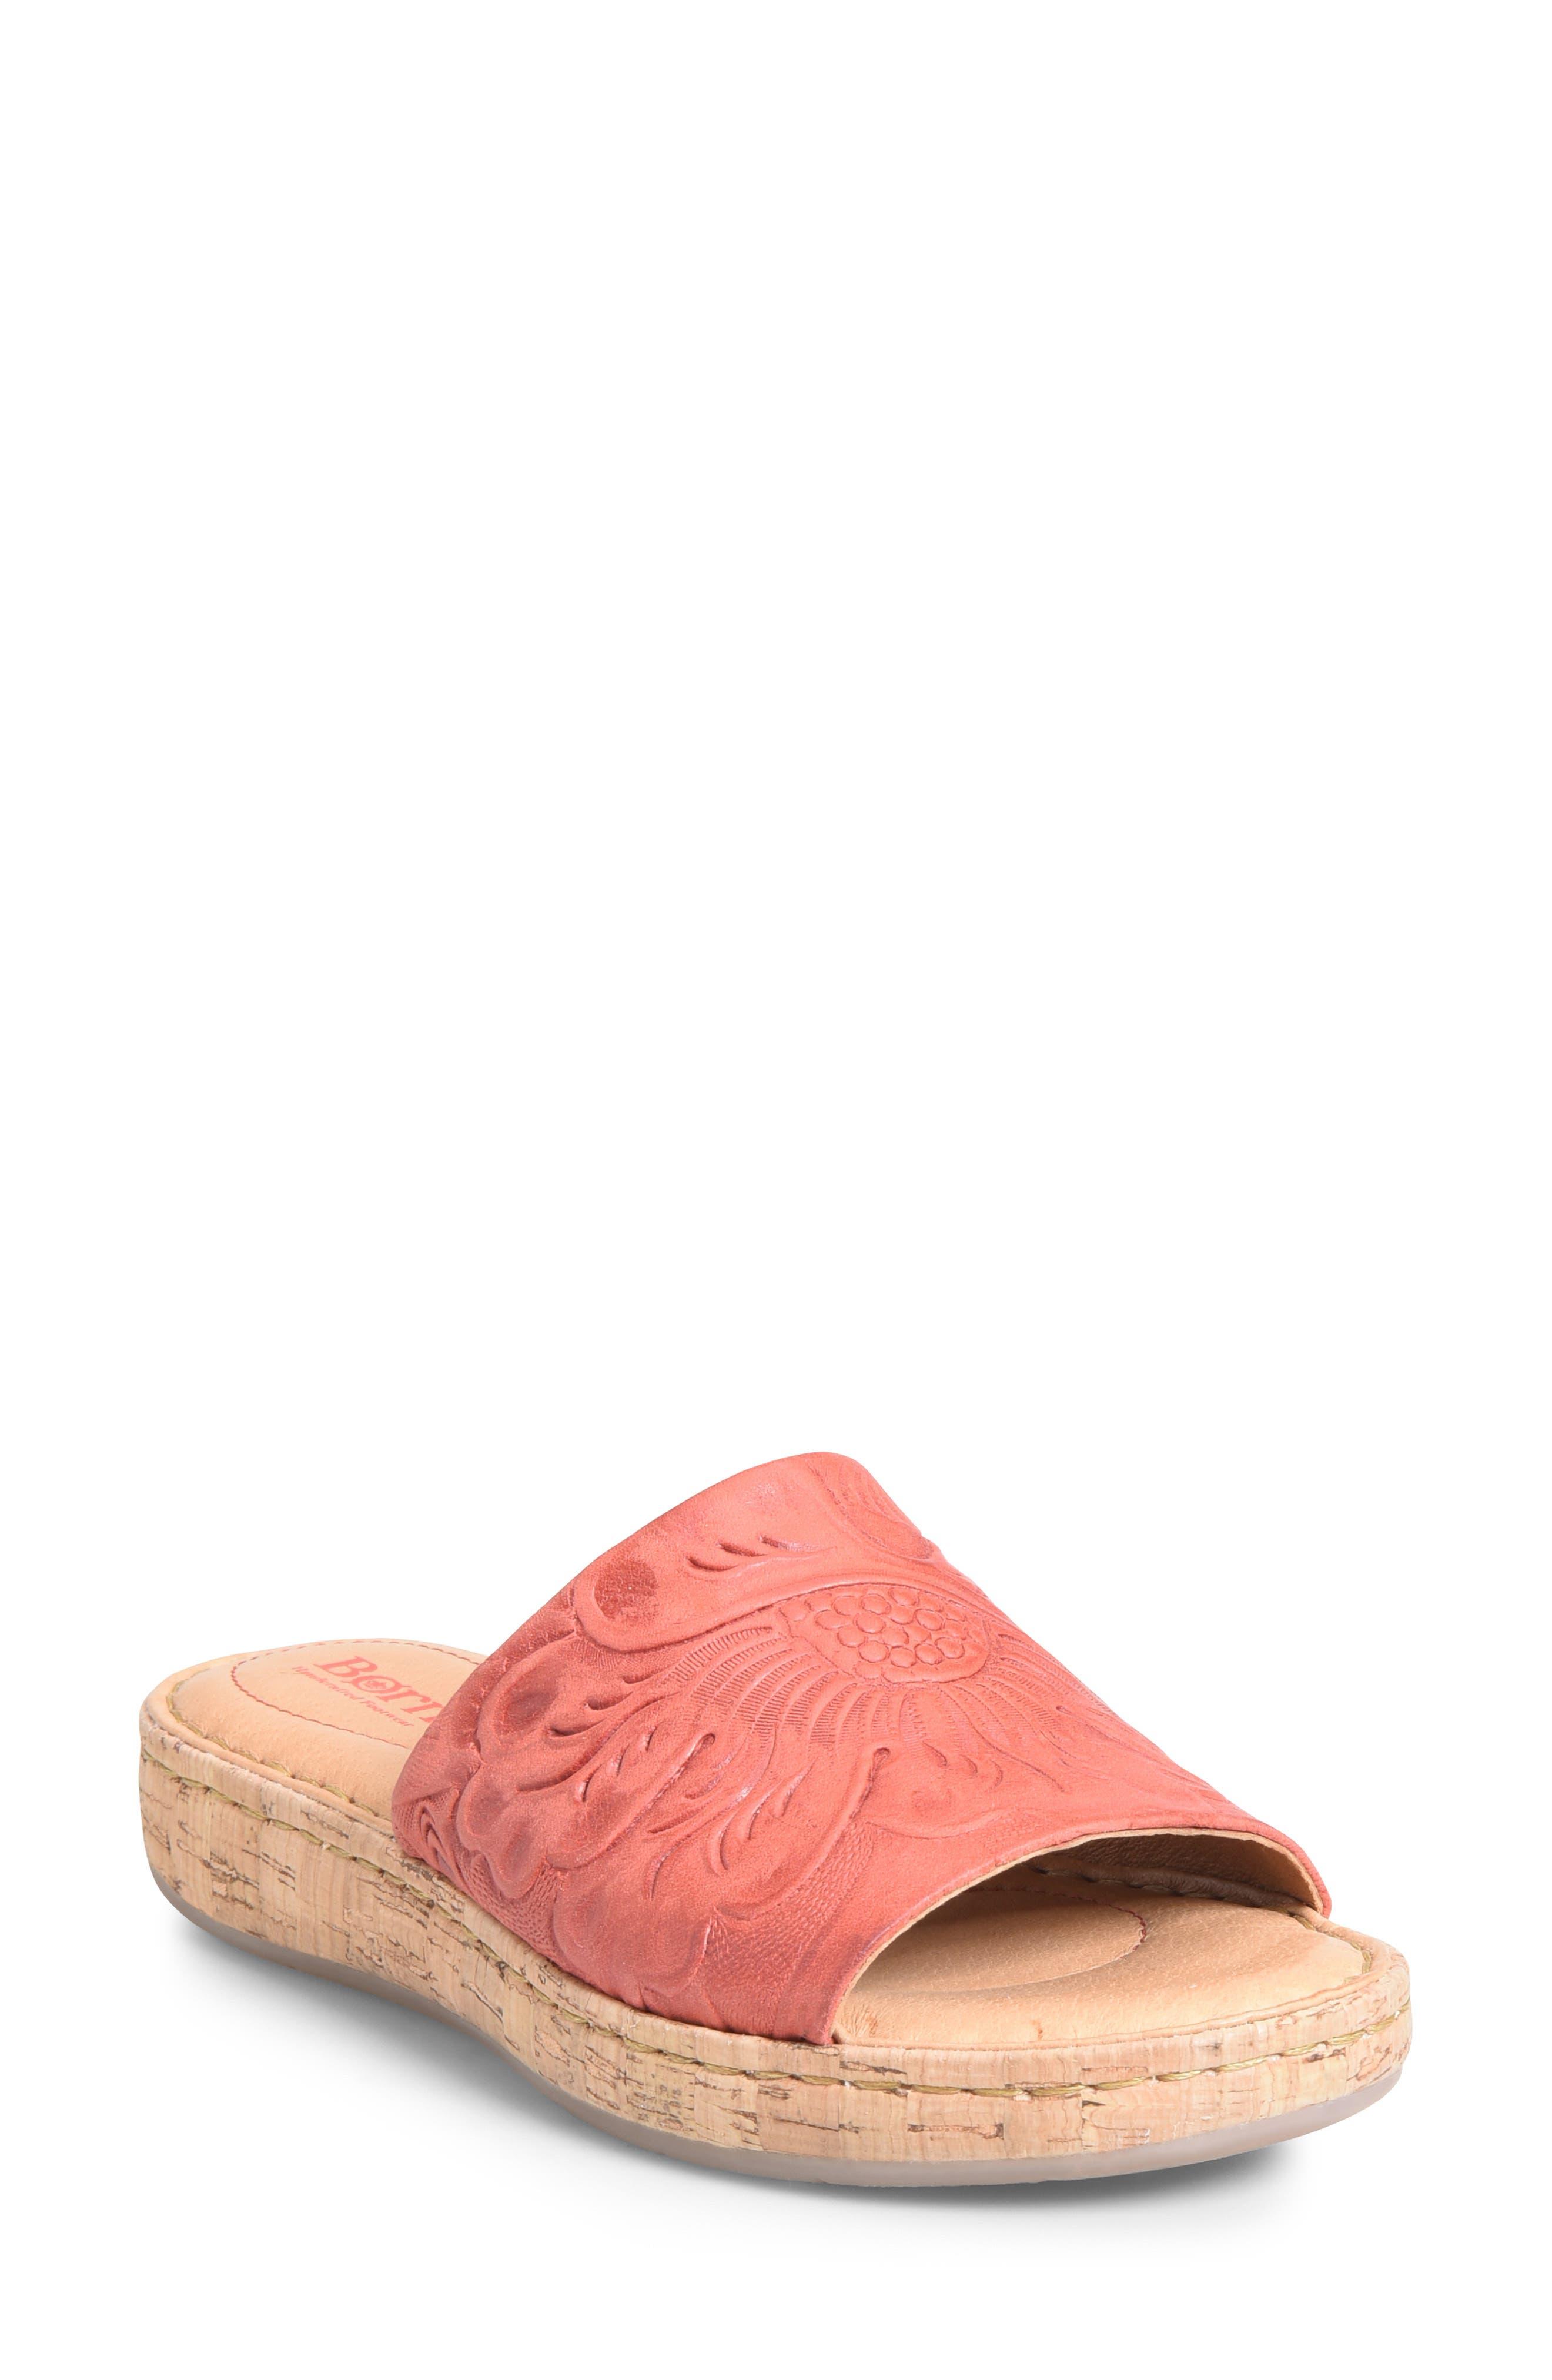 B?rn Fish Lake Tooled Slide Sandal, Red